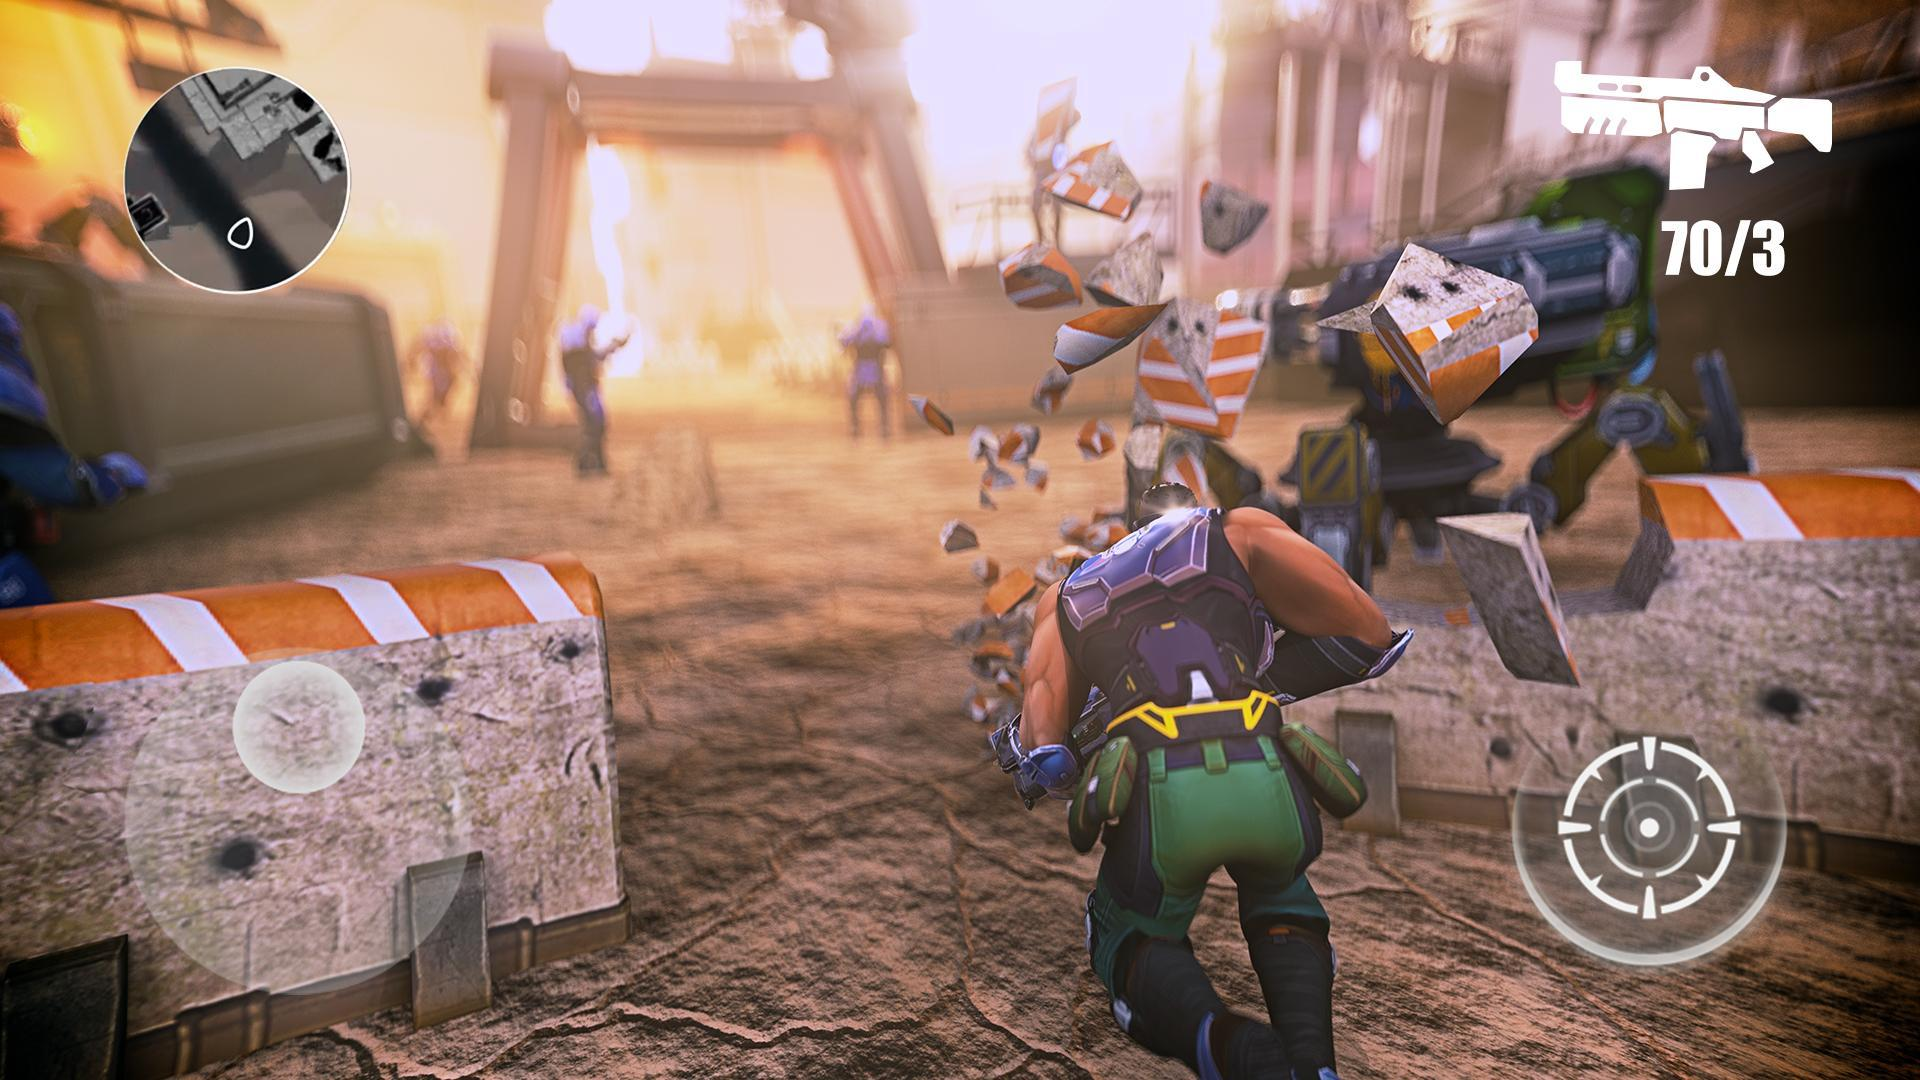 Evolution 2 Battle for Utopia. Action games 0.580.78866 Screenshot 2